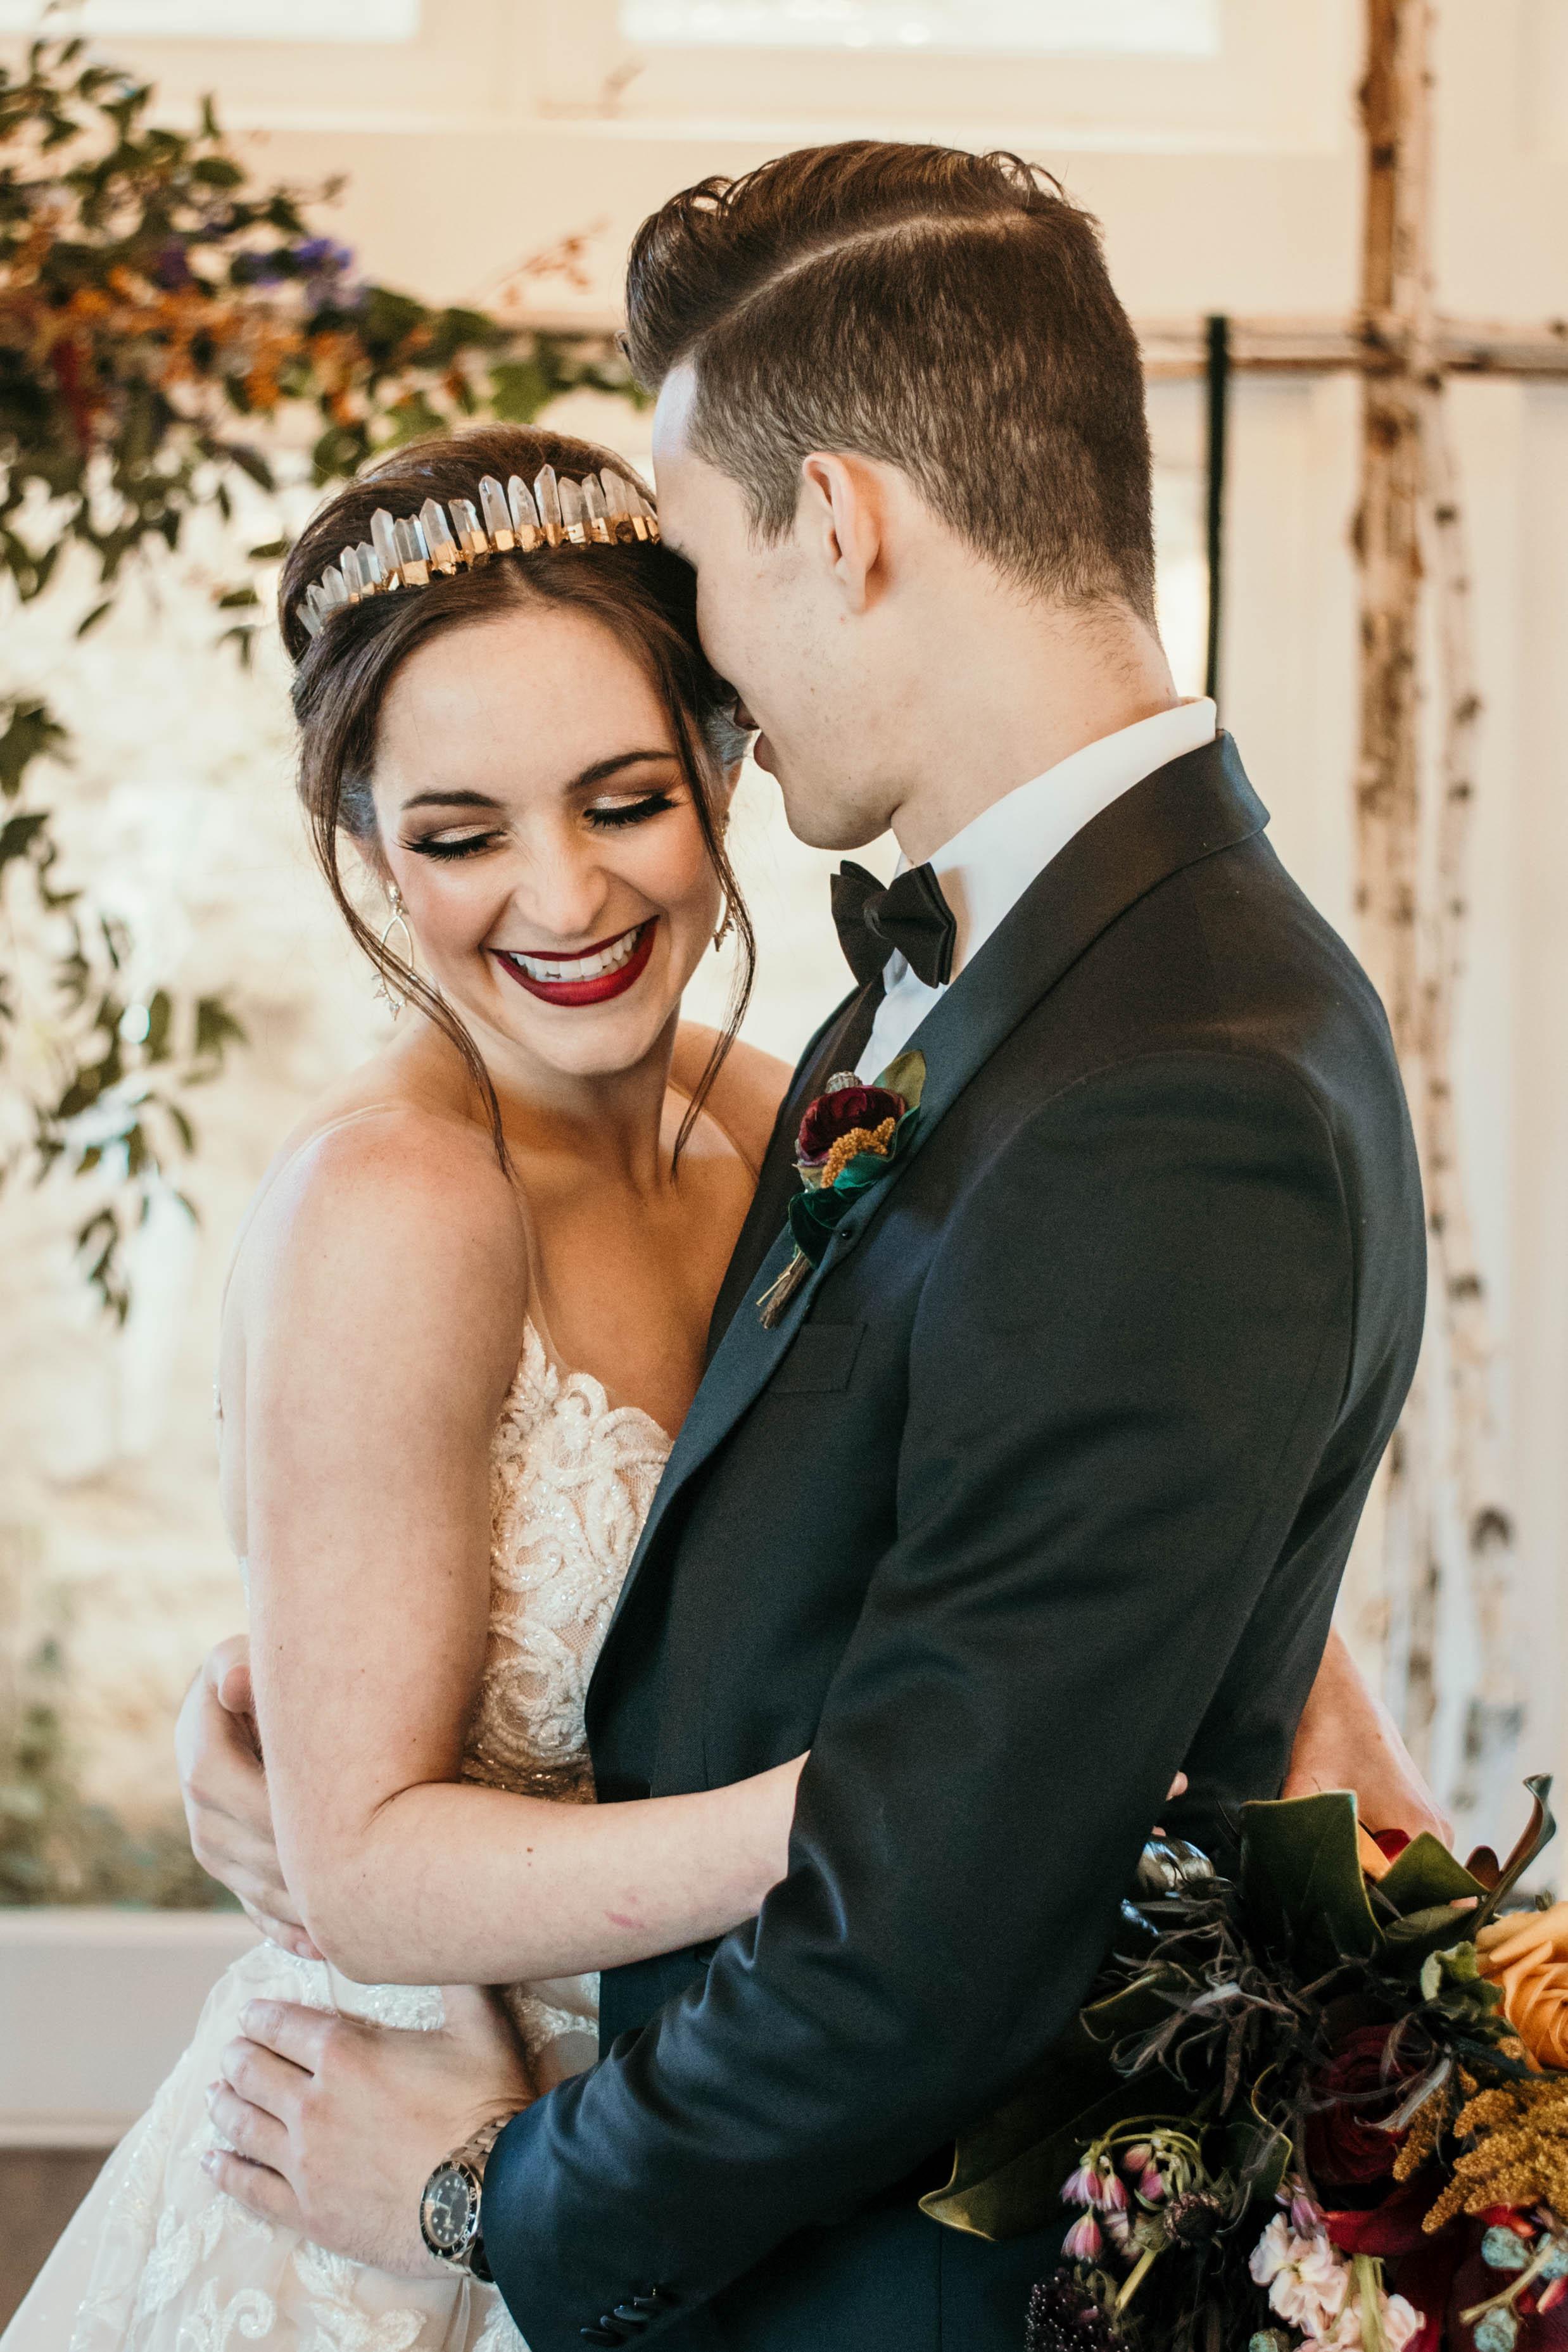 Austin Wedding Videographer - Dolls for Dolls (272 of 323).jpg